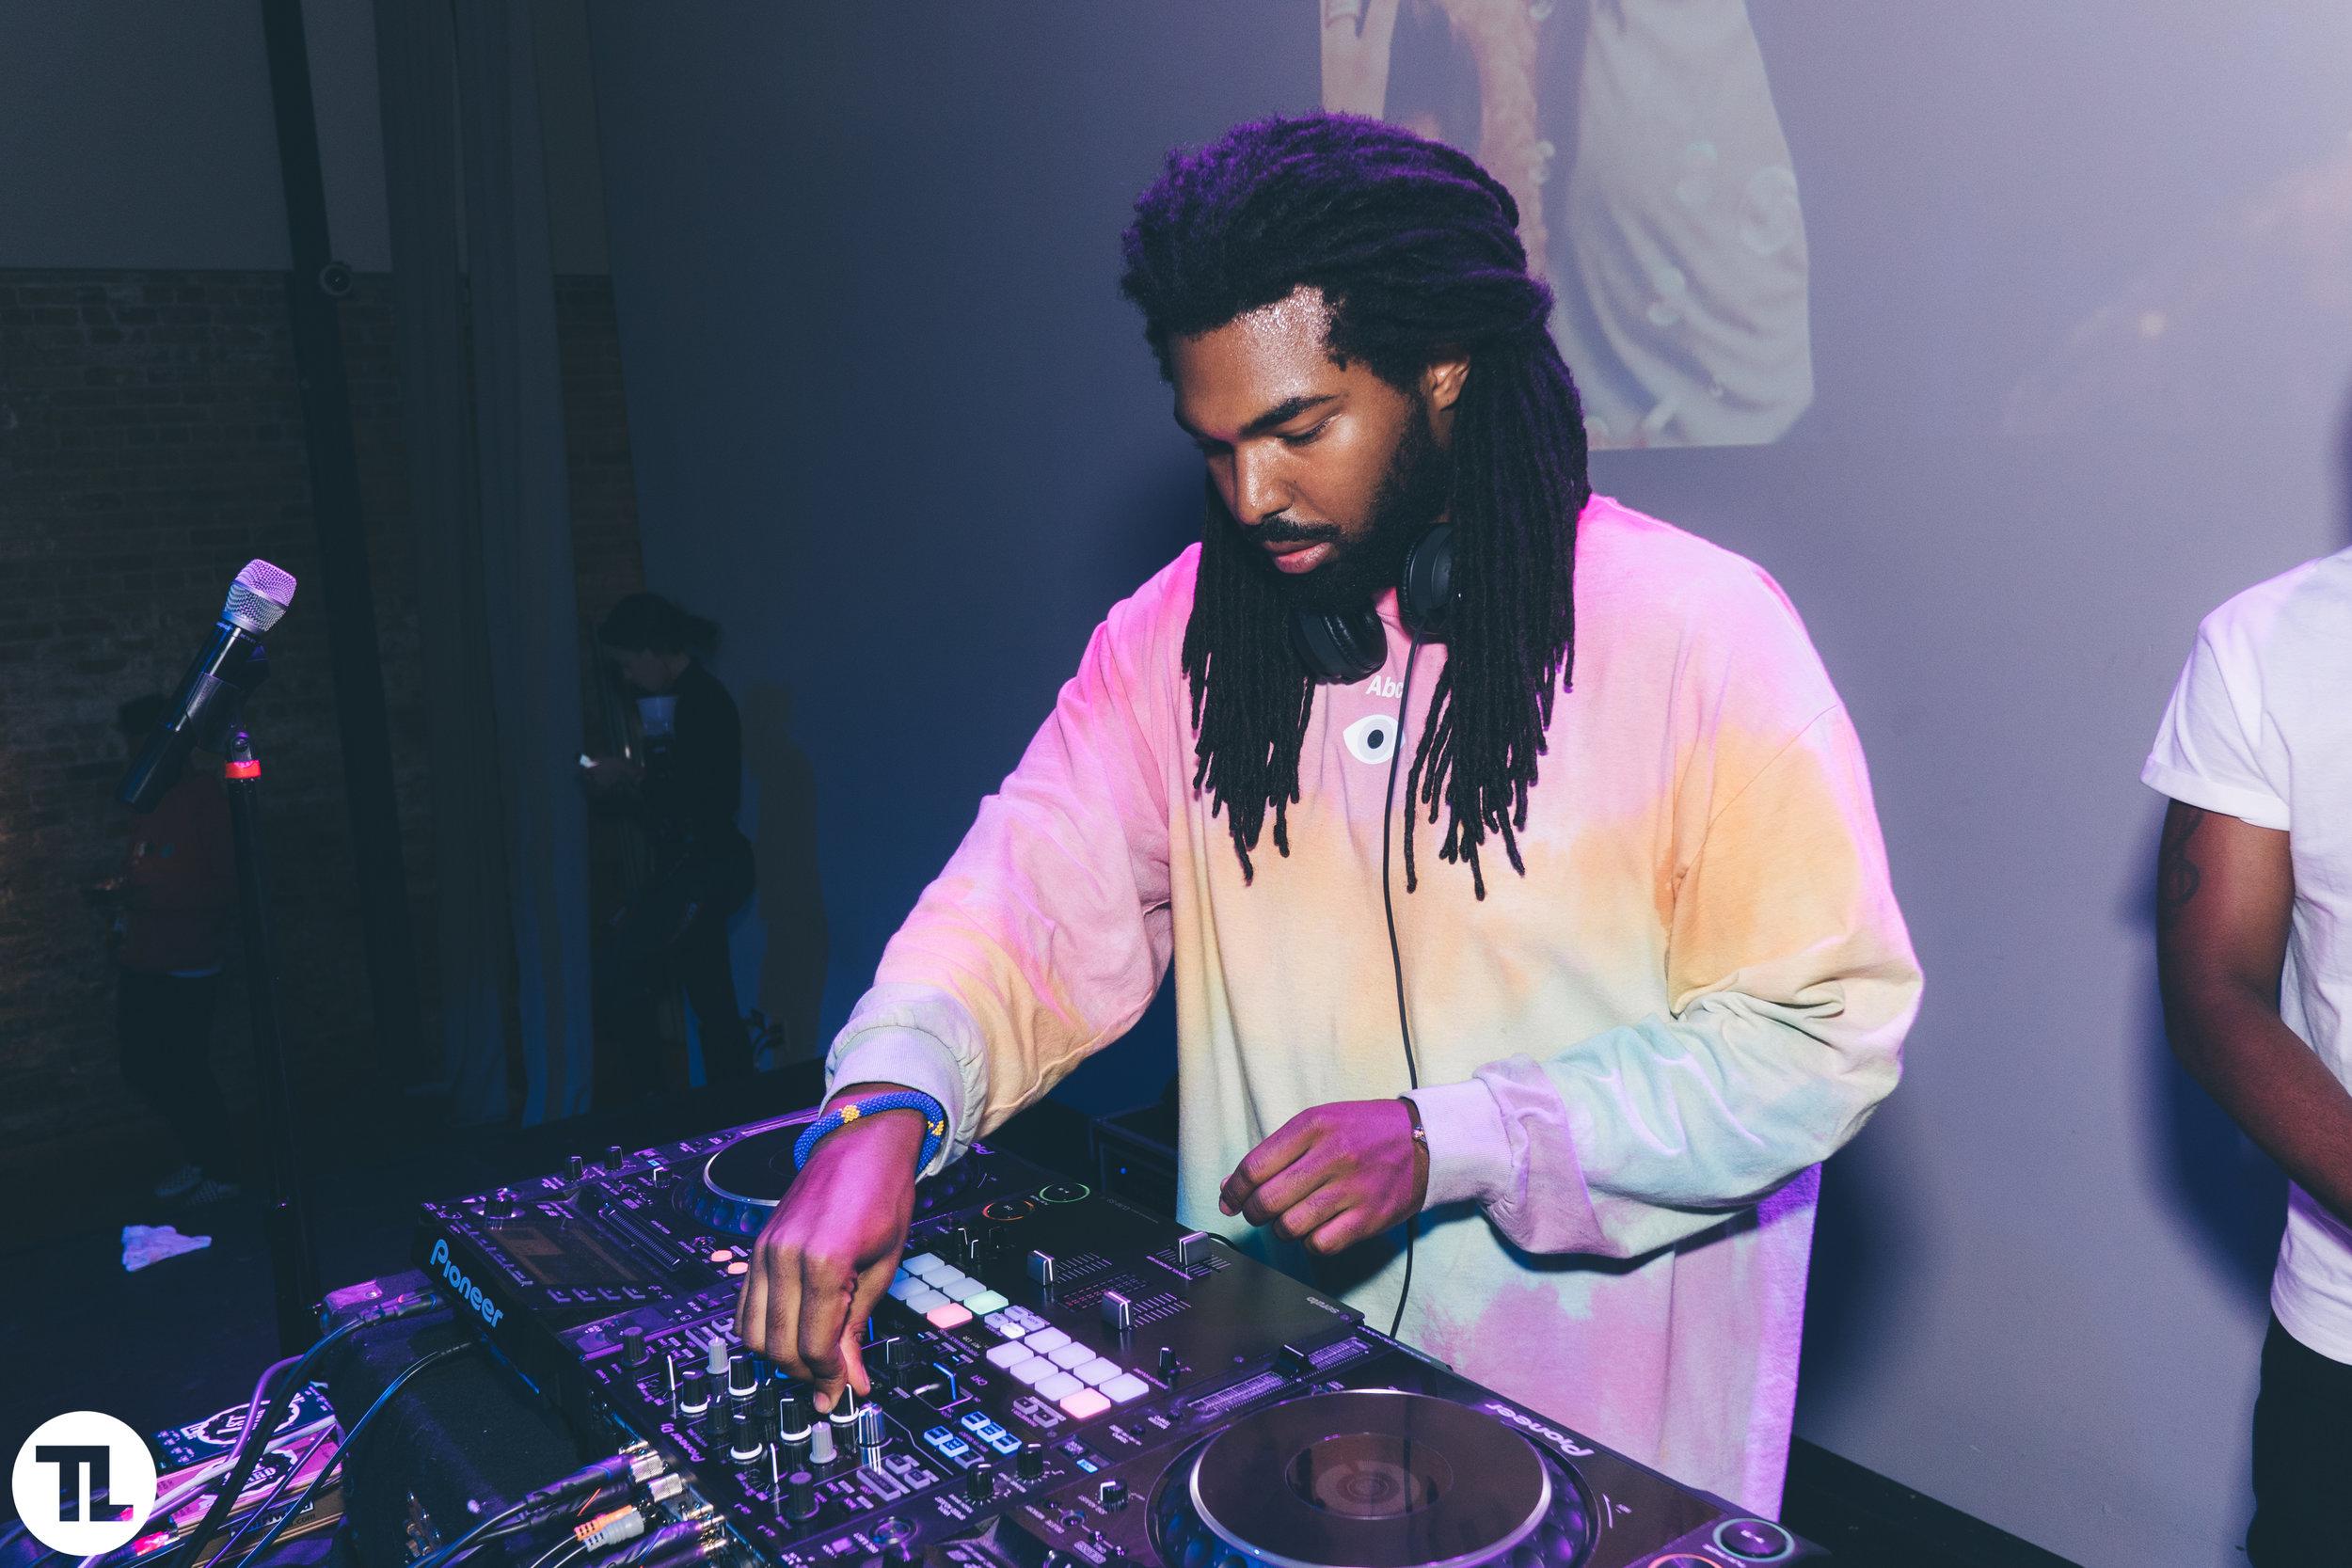 DJ Spicoli